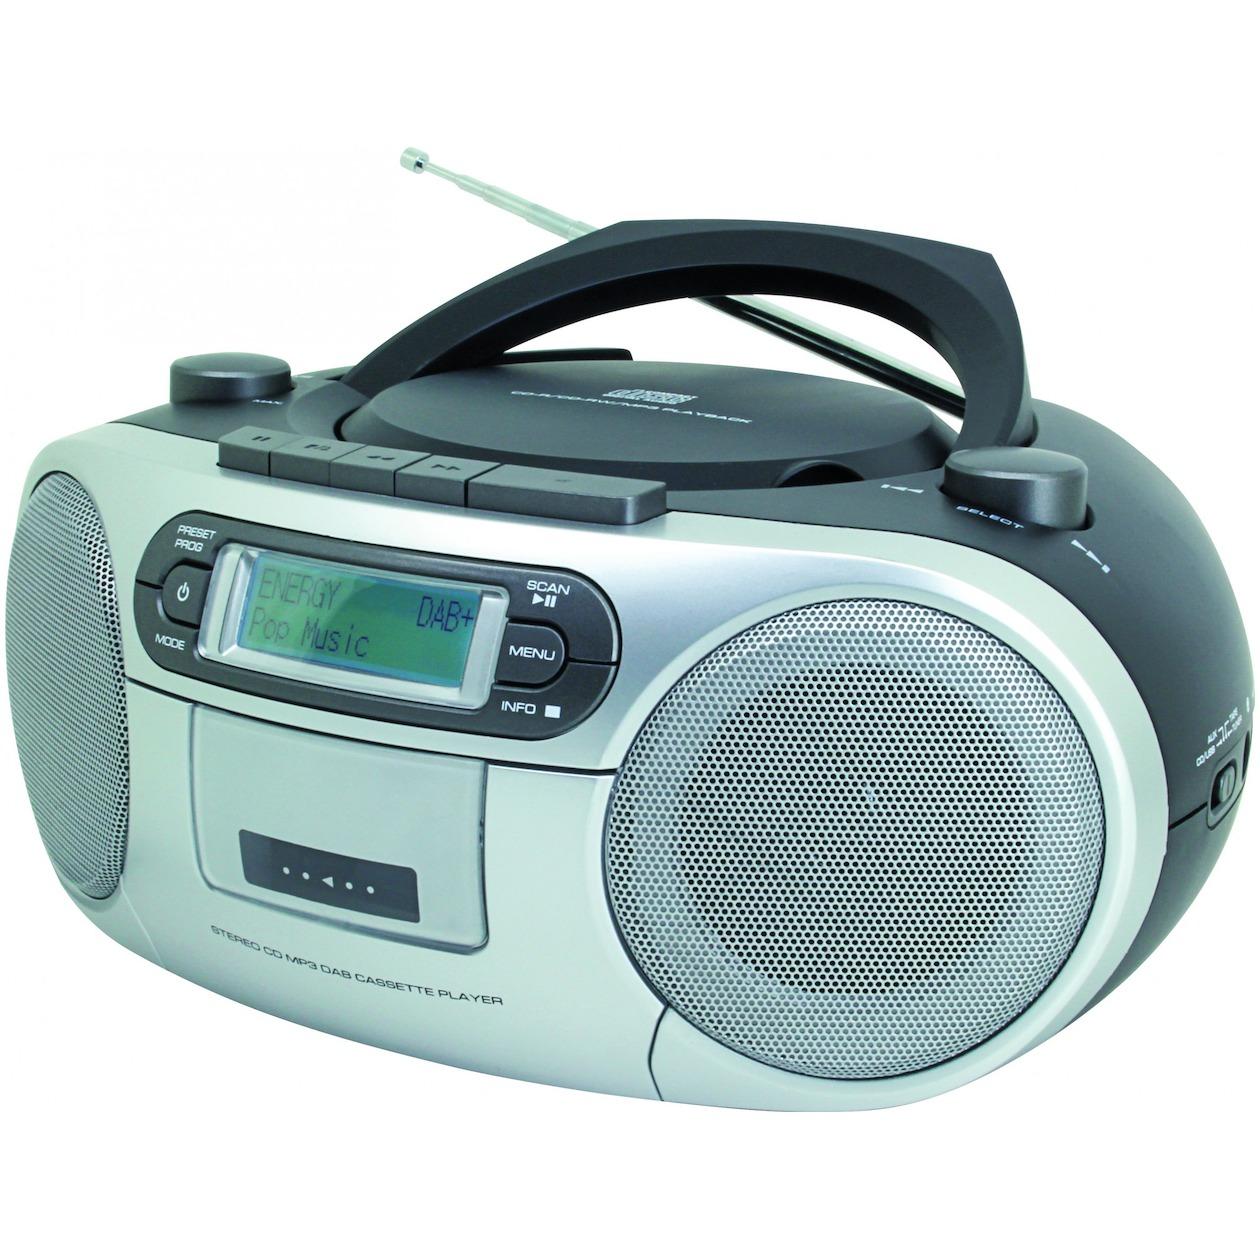 SoundMaster SCD7900 DAB+ radio CD-radio Zwart